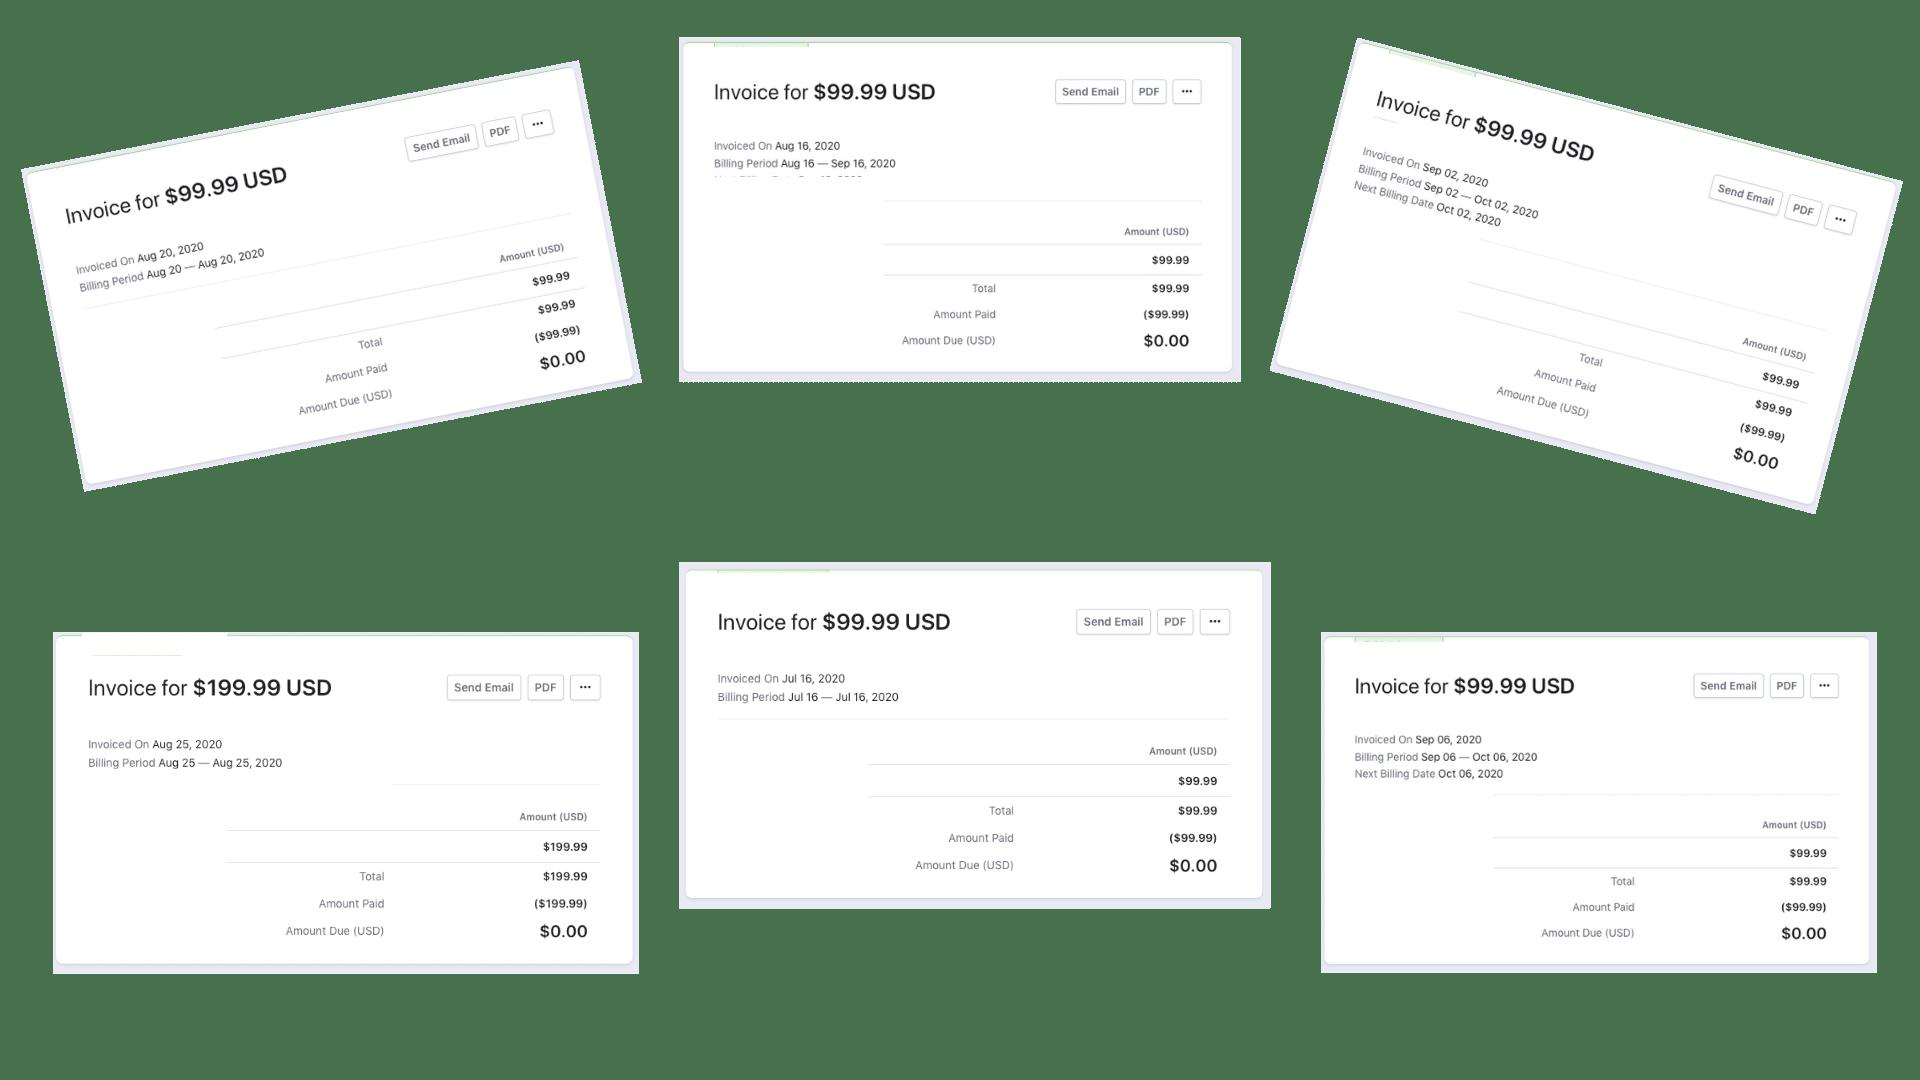 Credit Repair Cloud Payments I Received